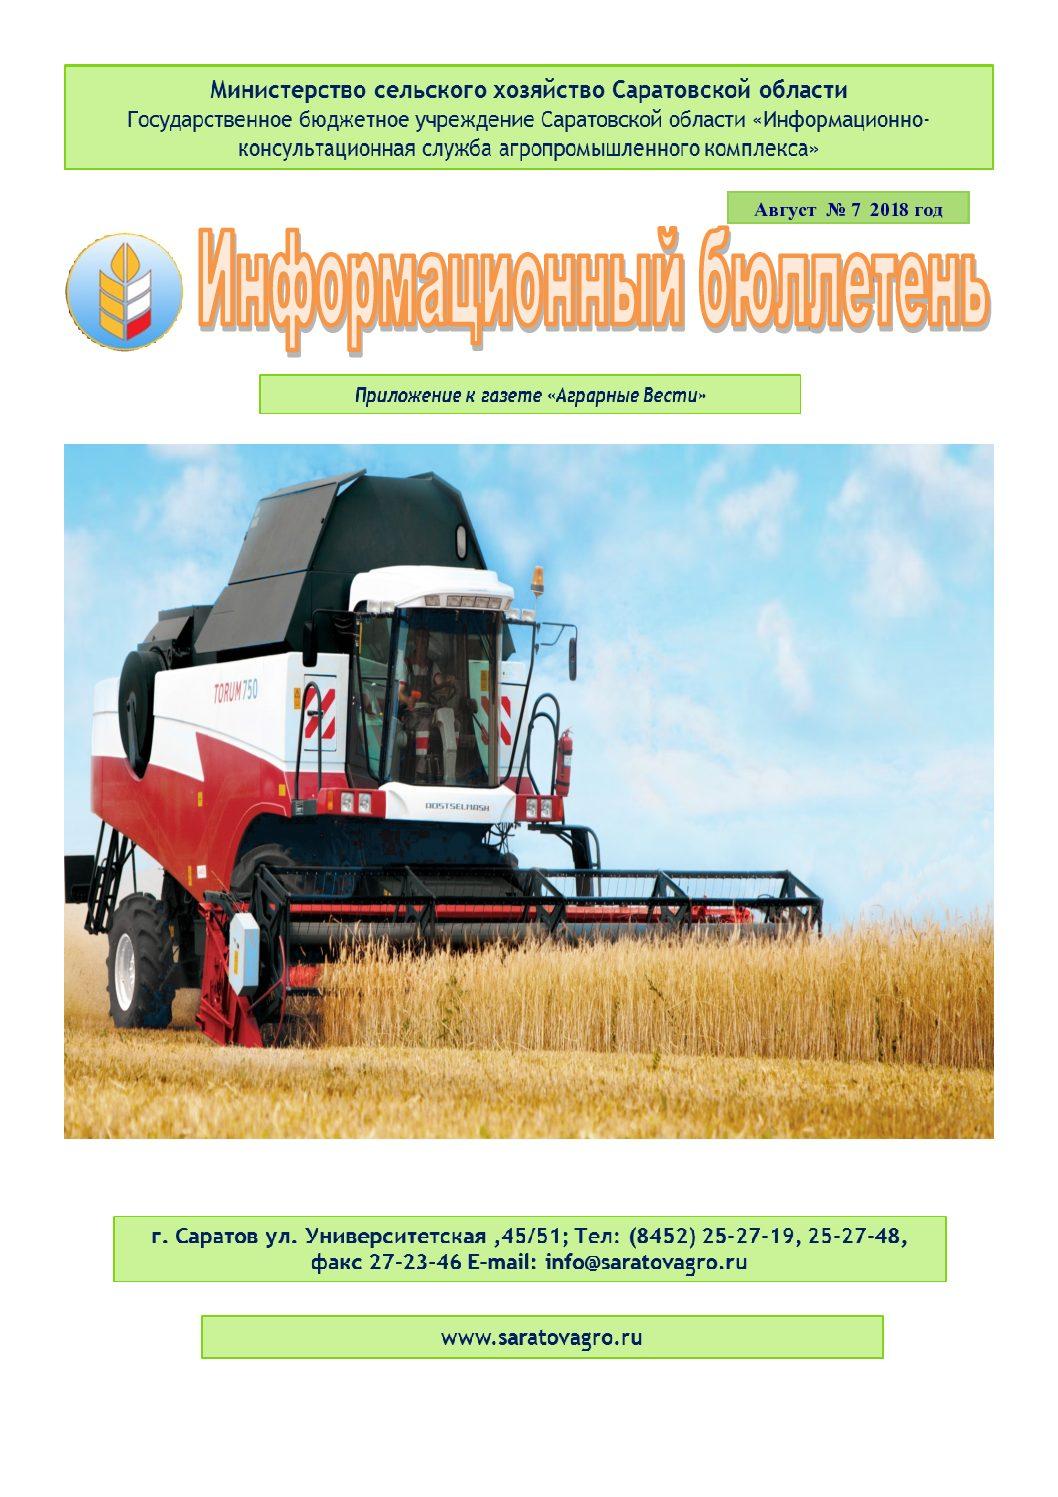 https://saratovagro.ru/wp-content/uploads/2020/08/7.2018-1-pdf.jpg